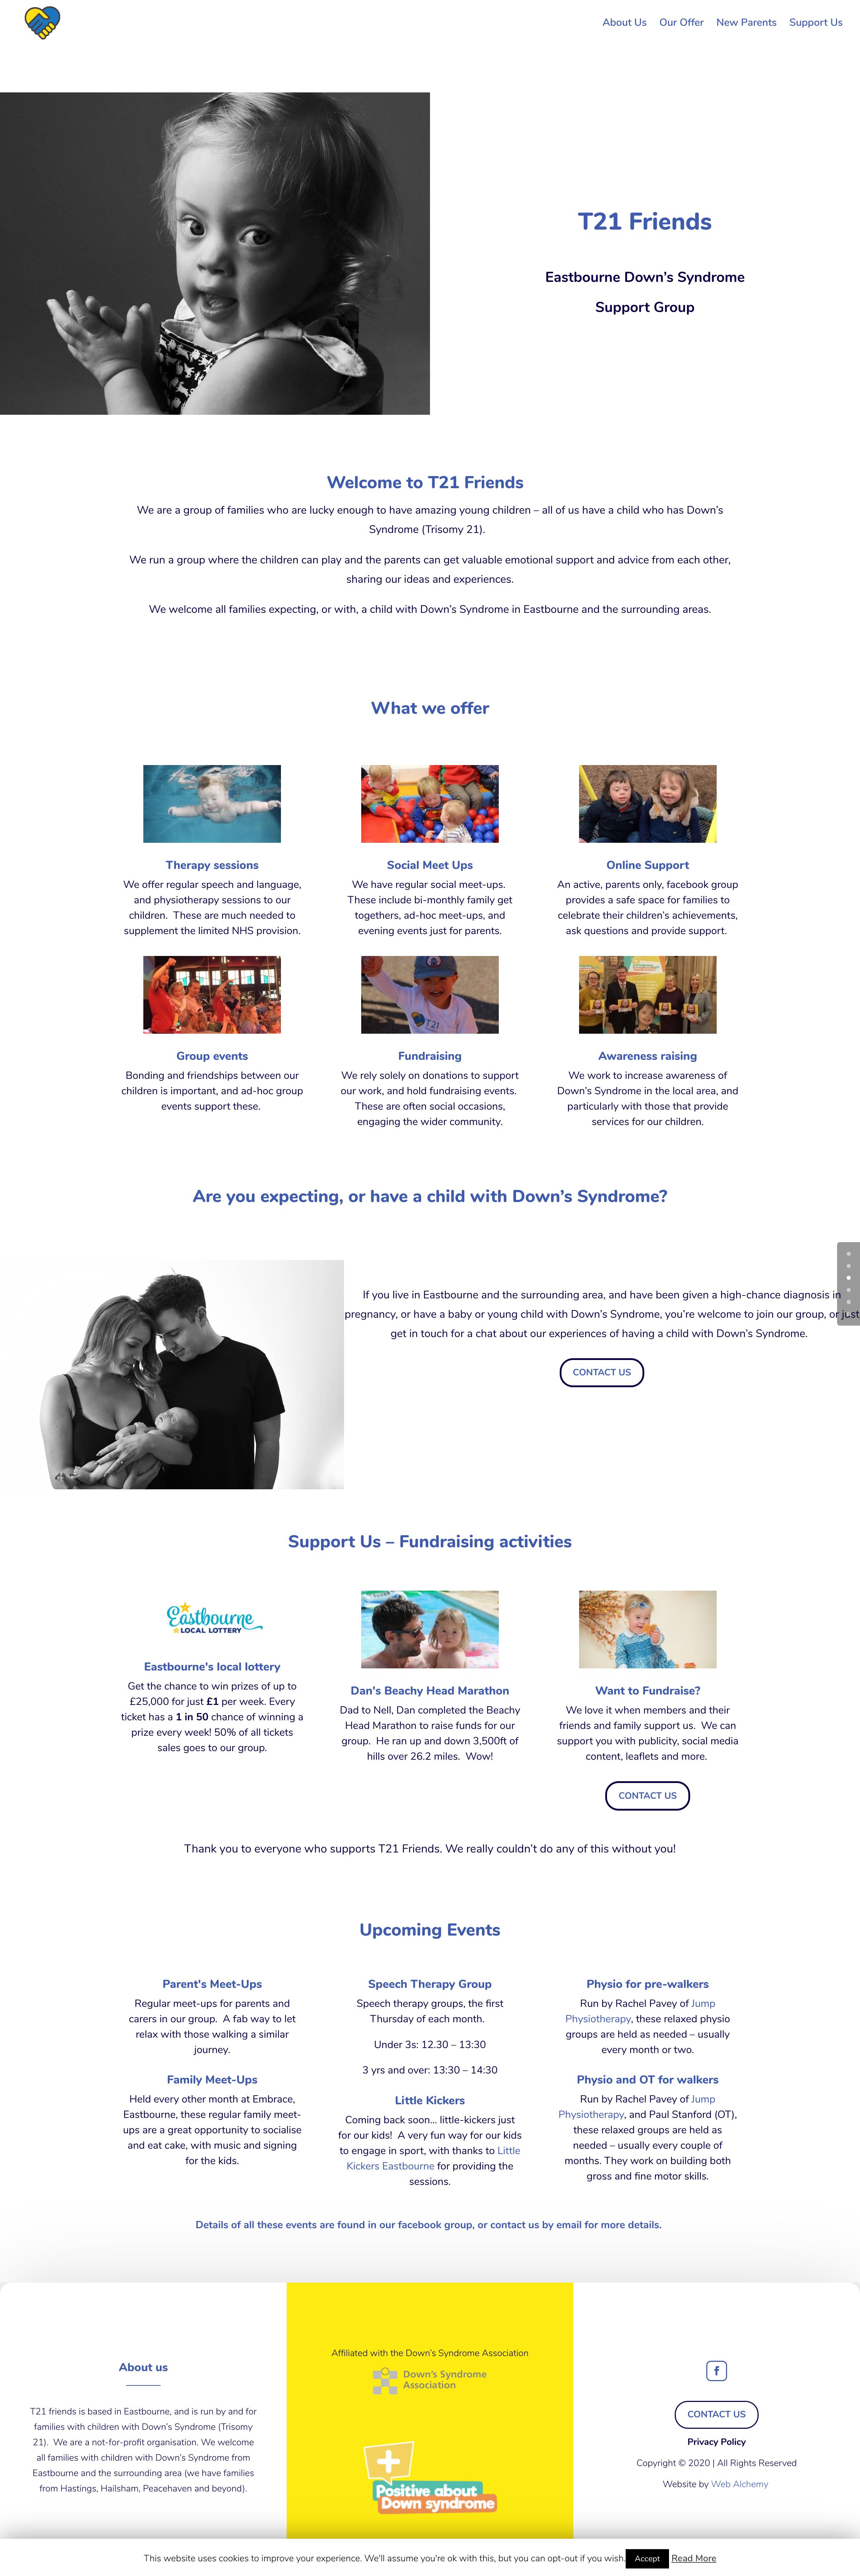 T21 friends website